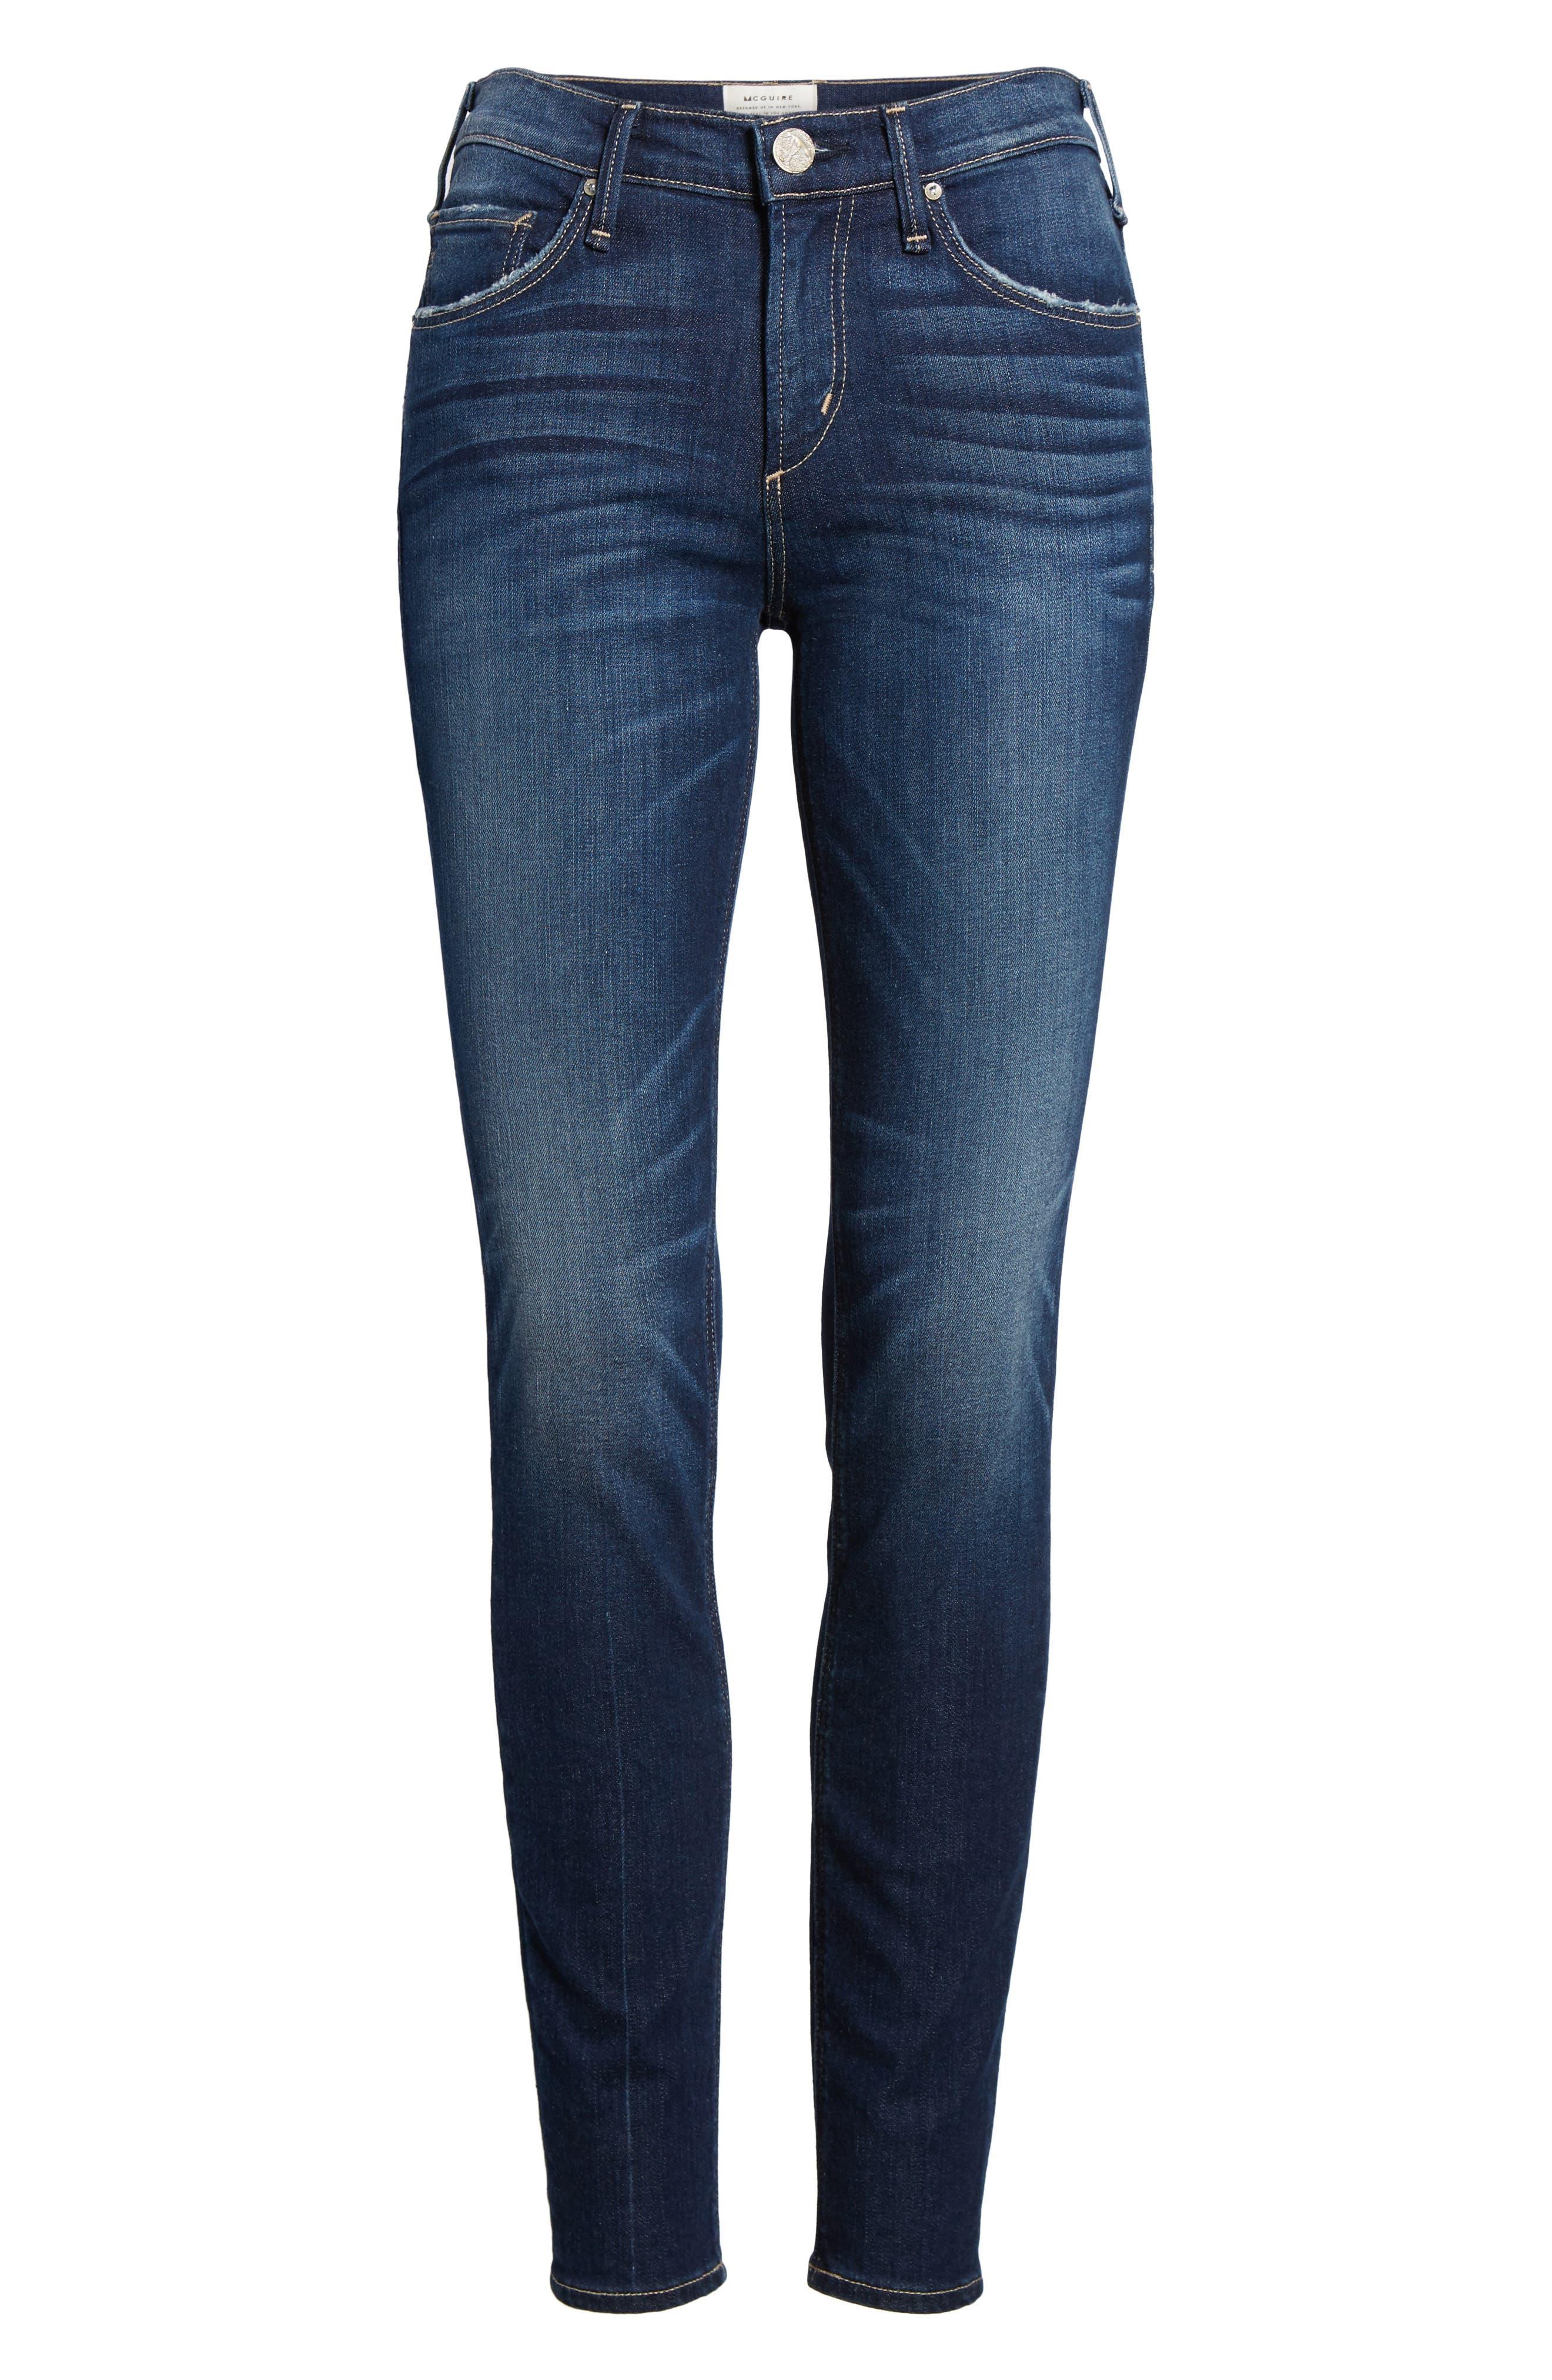 Newton Skinny Jeans,                             Alternate thumbnail 7, color,                             Chateau